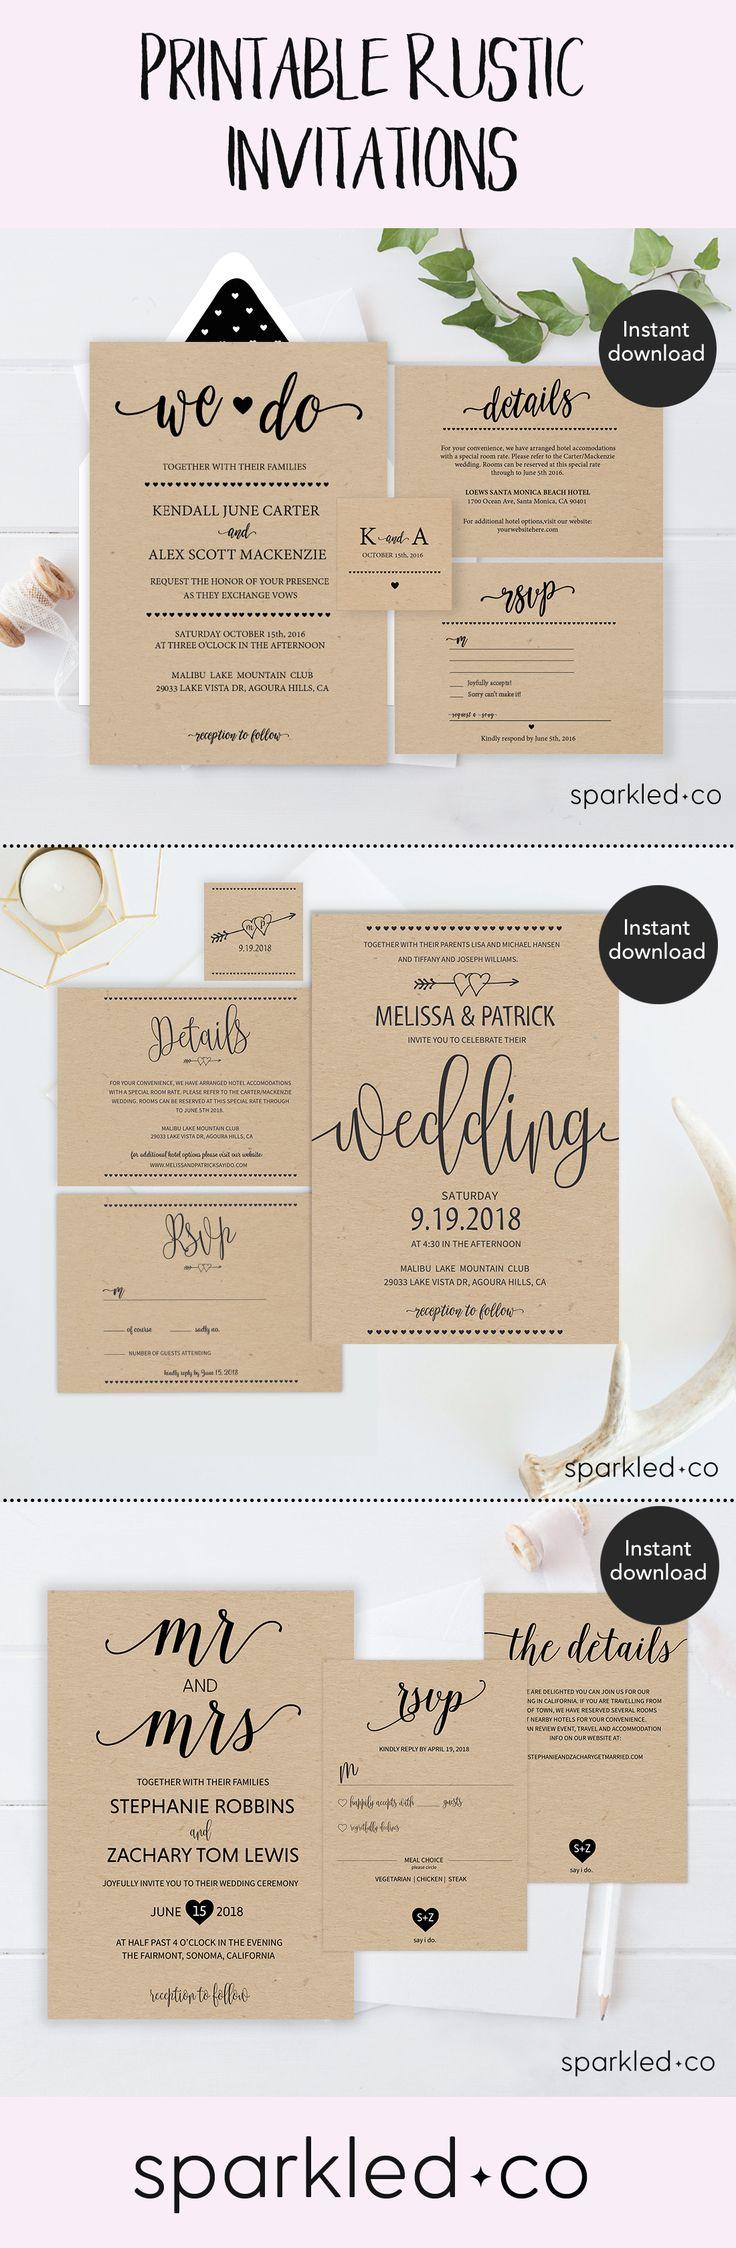 affordable wedding invitations budget wedding invitations Rustic Wedding Invitation Template Wedding Invitation Templates Wedding Cards Cheap Wedding Invitations Printable Wedding Invitations